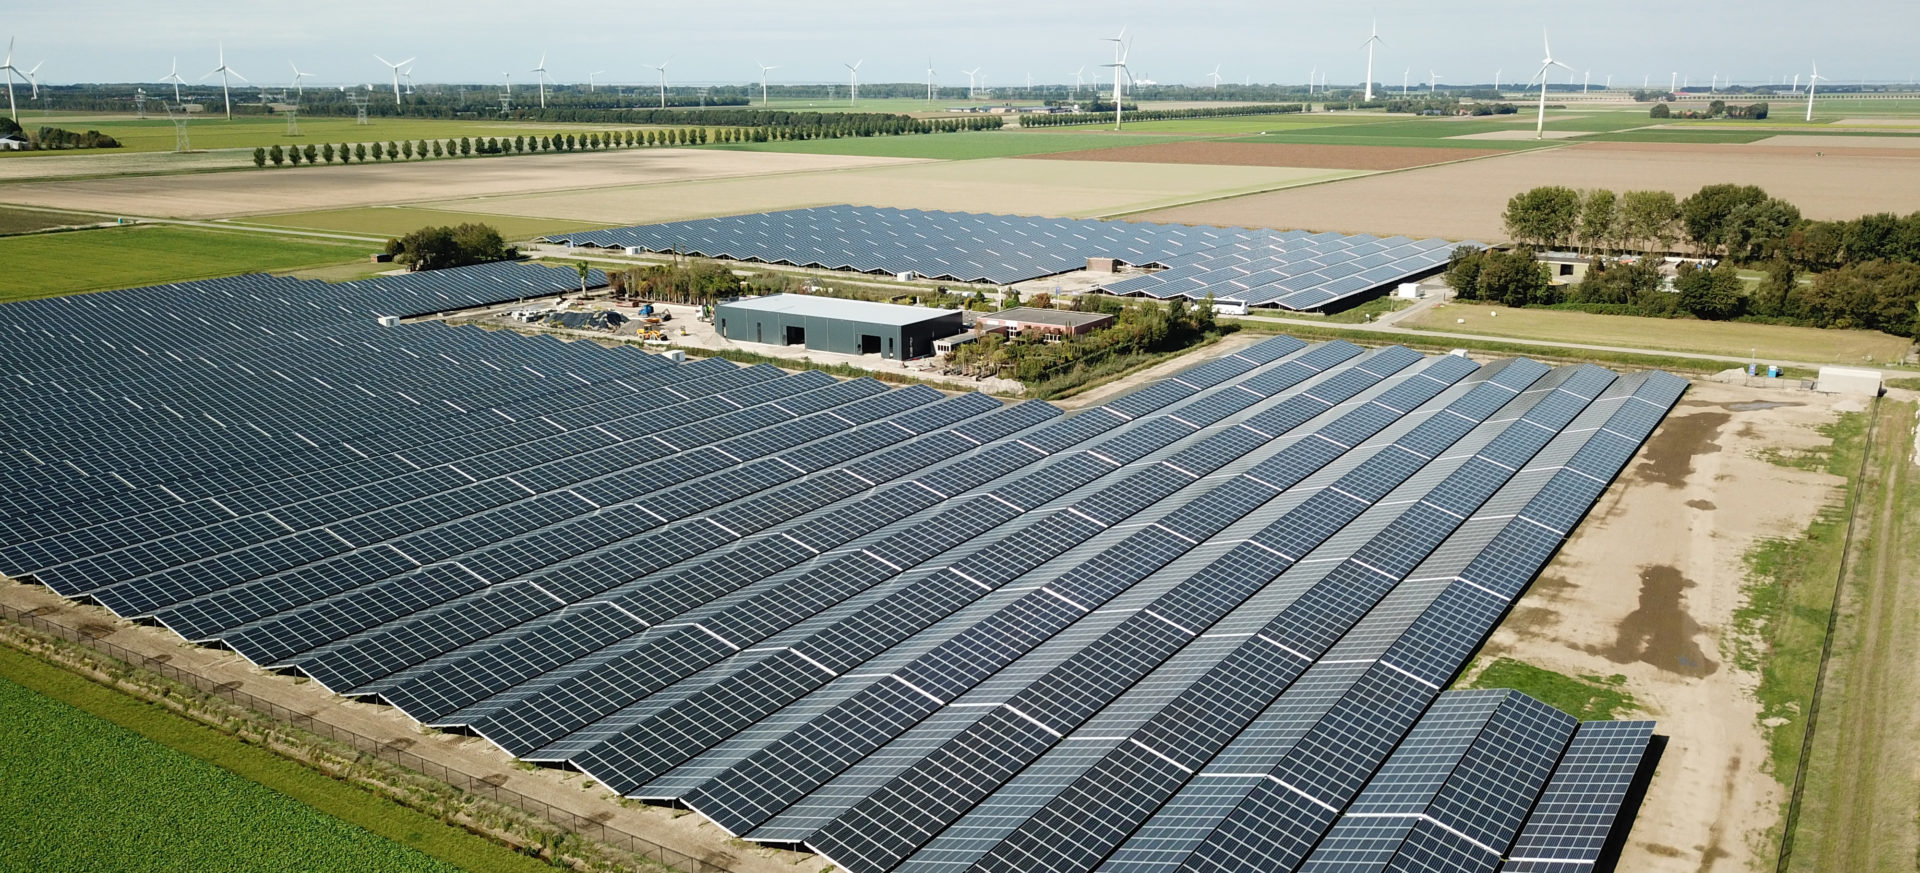 Luftaufnahme des Solarparks in Lelystad, Niederlanden